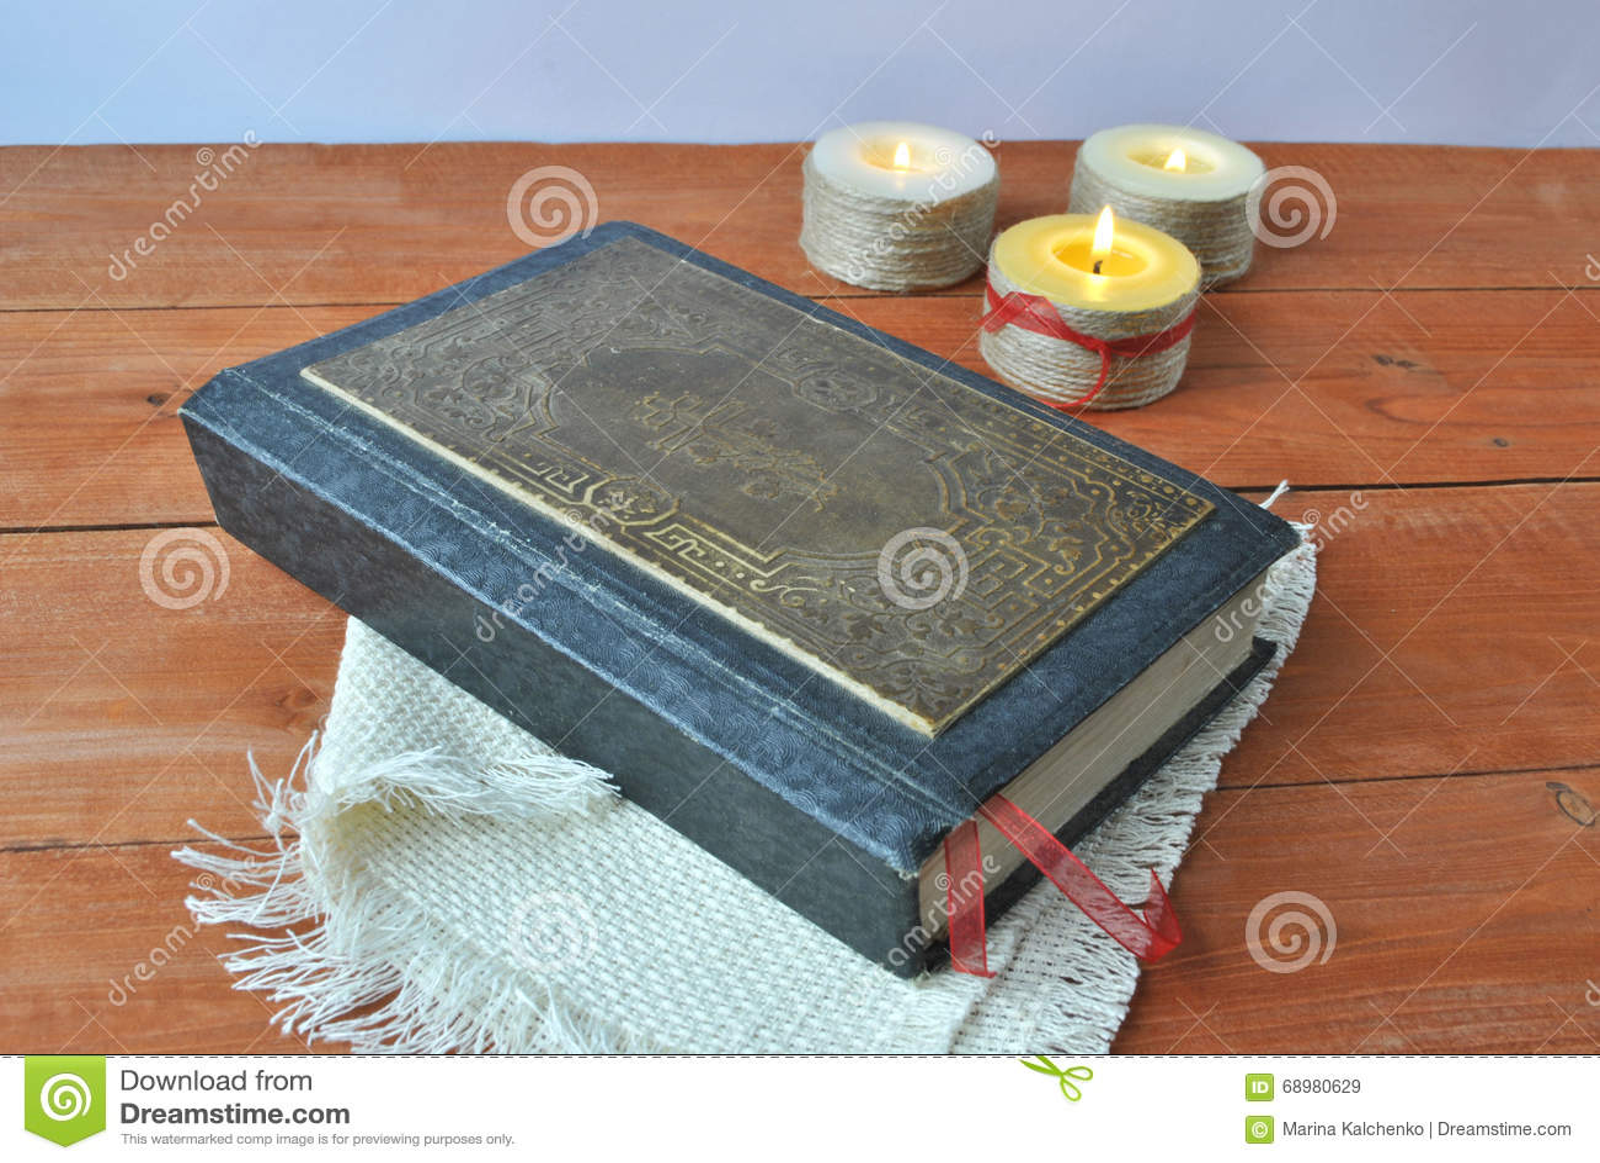 Biblia antigua en un fondo de velas